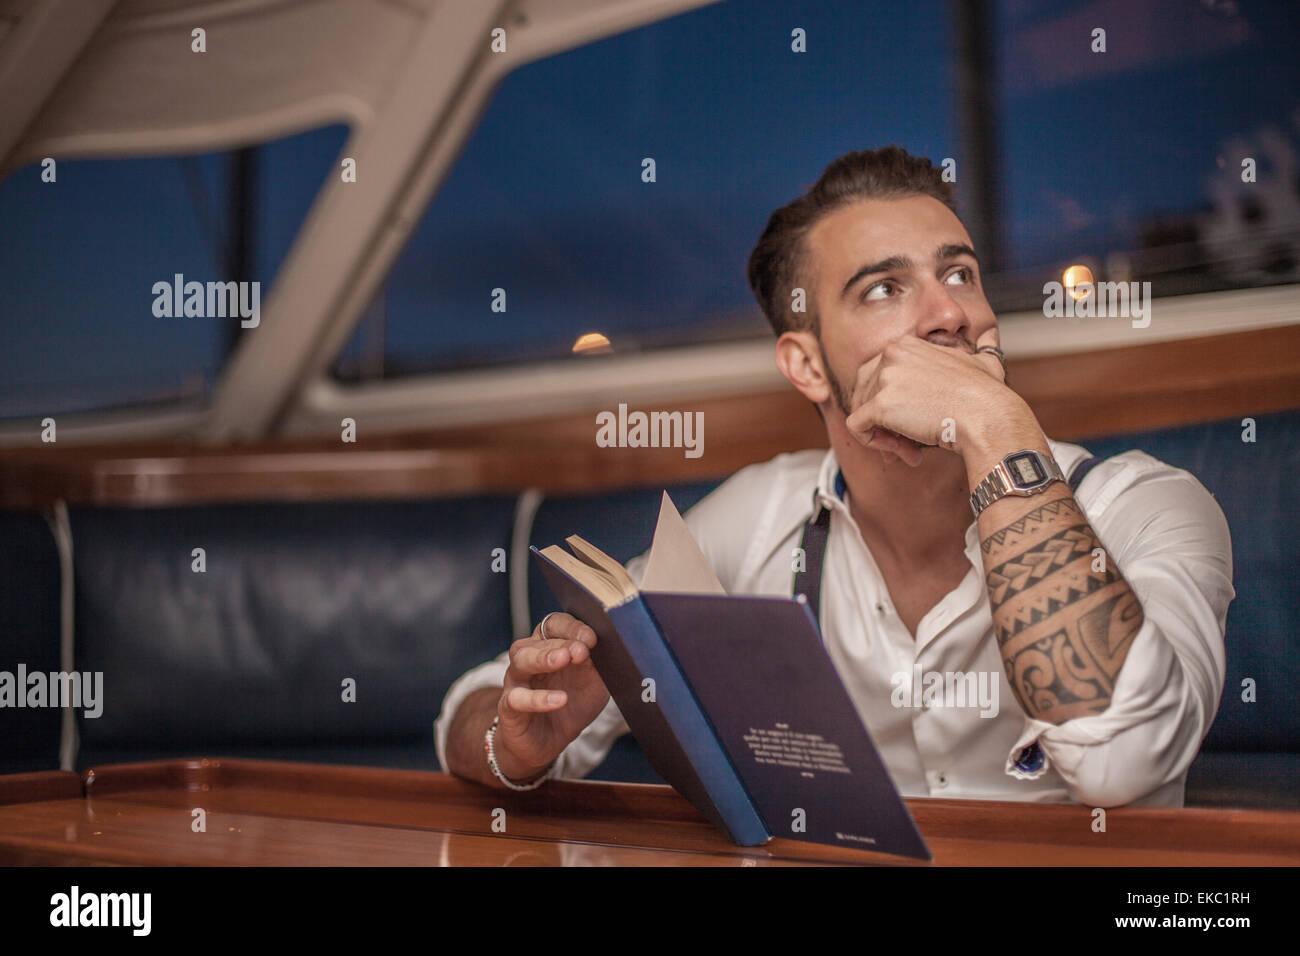 Young man reading inside yacht, Cagliari, Sardinia, Italy - Stock Image